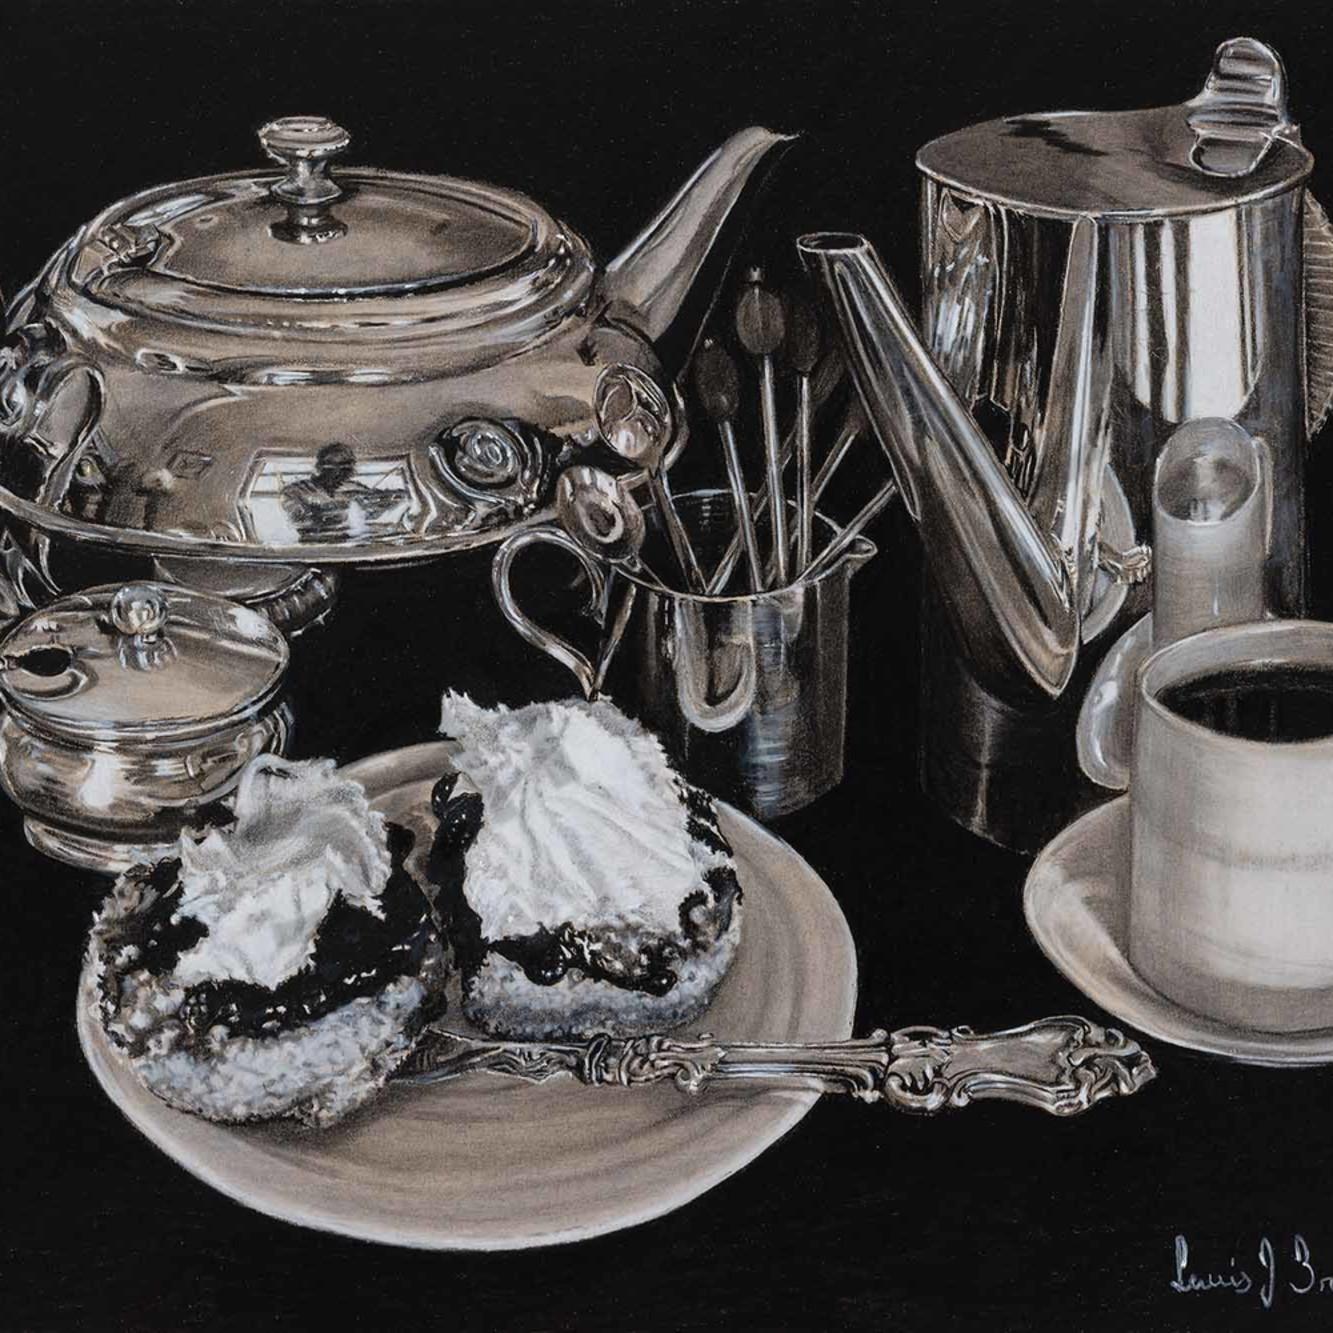 L brennan 049 my cup of tea 2000px ydvuym